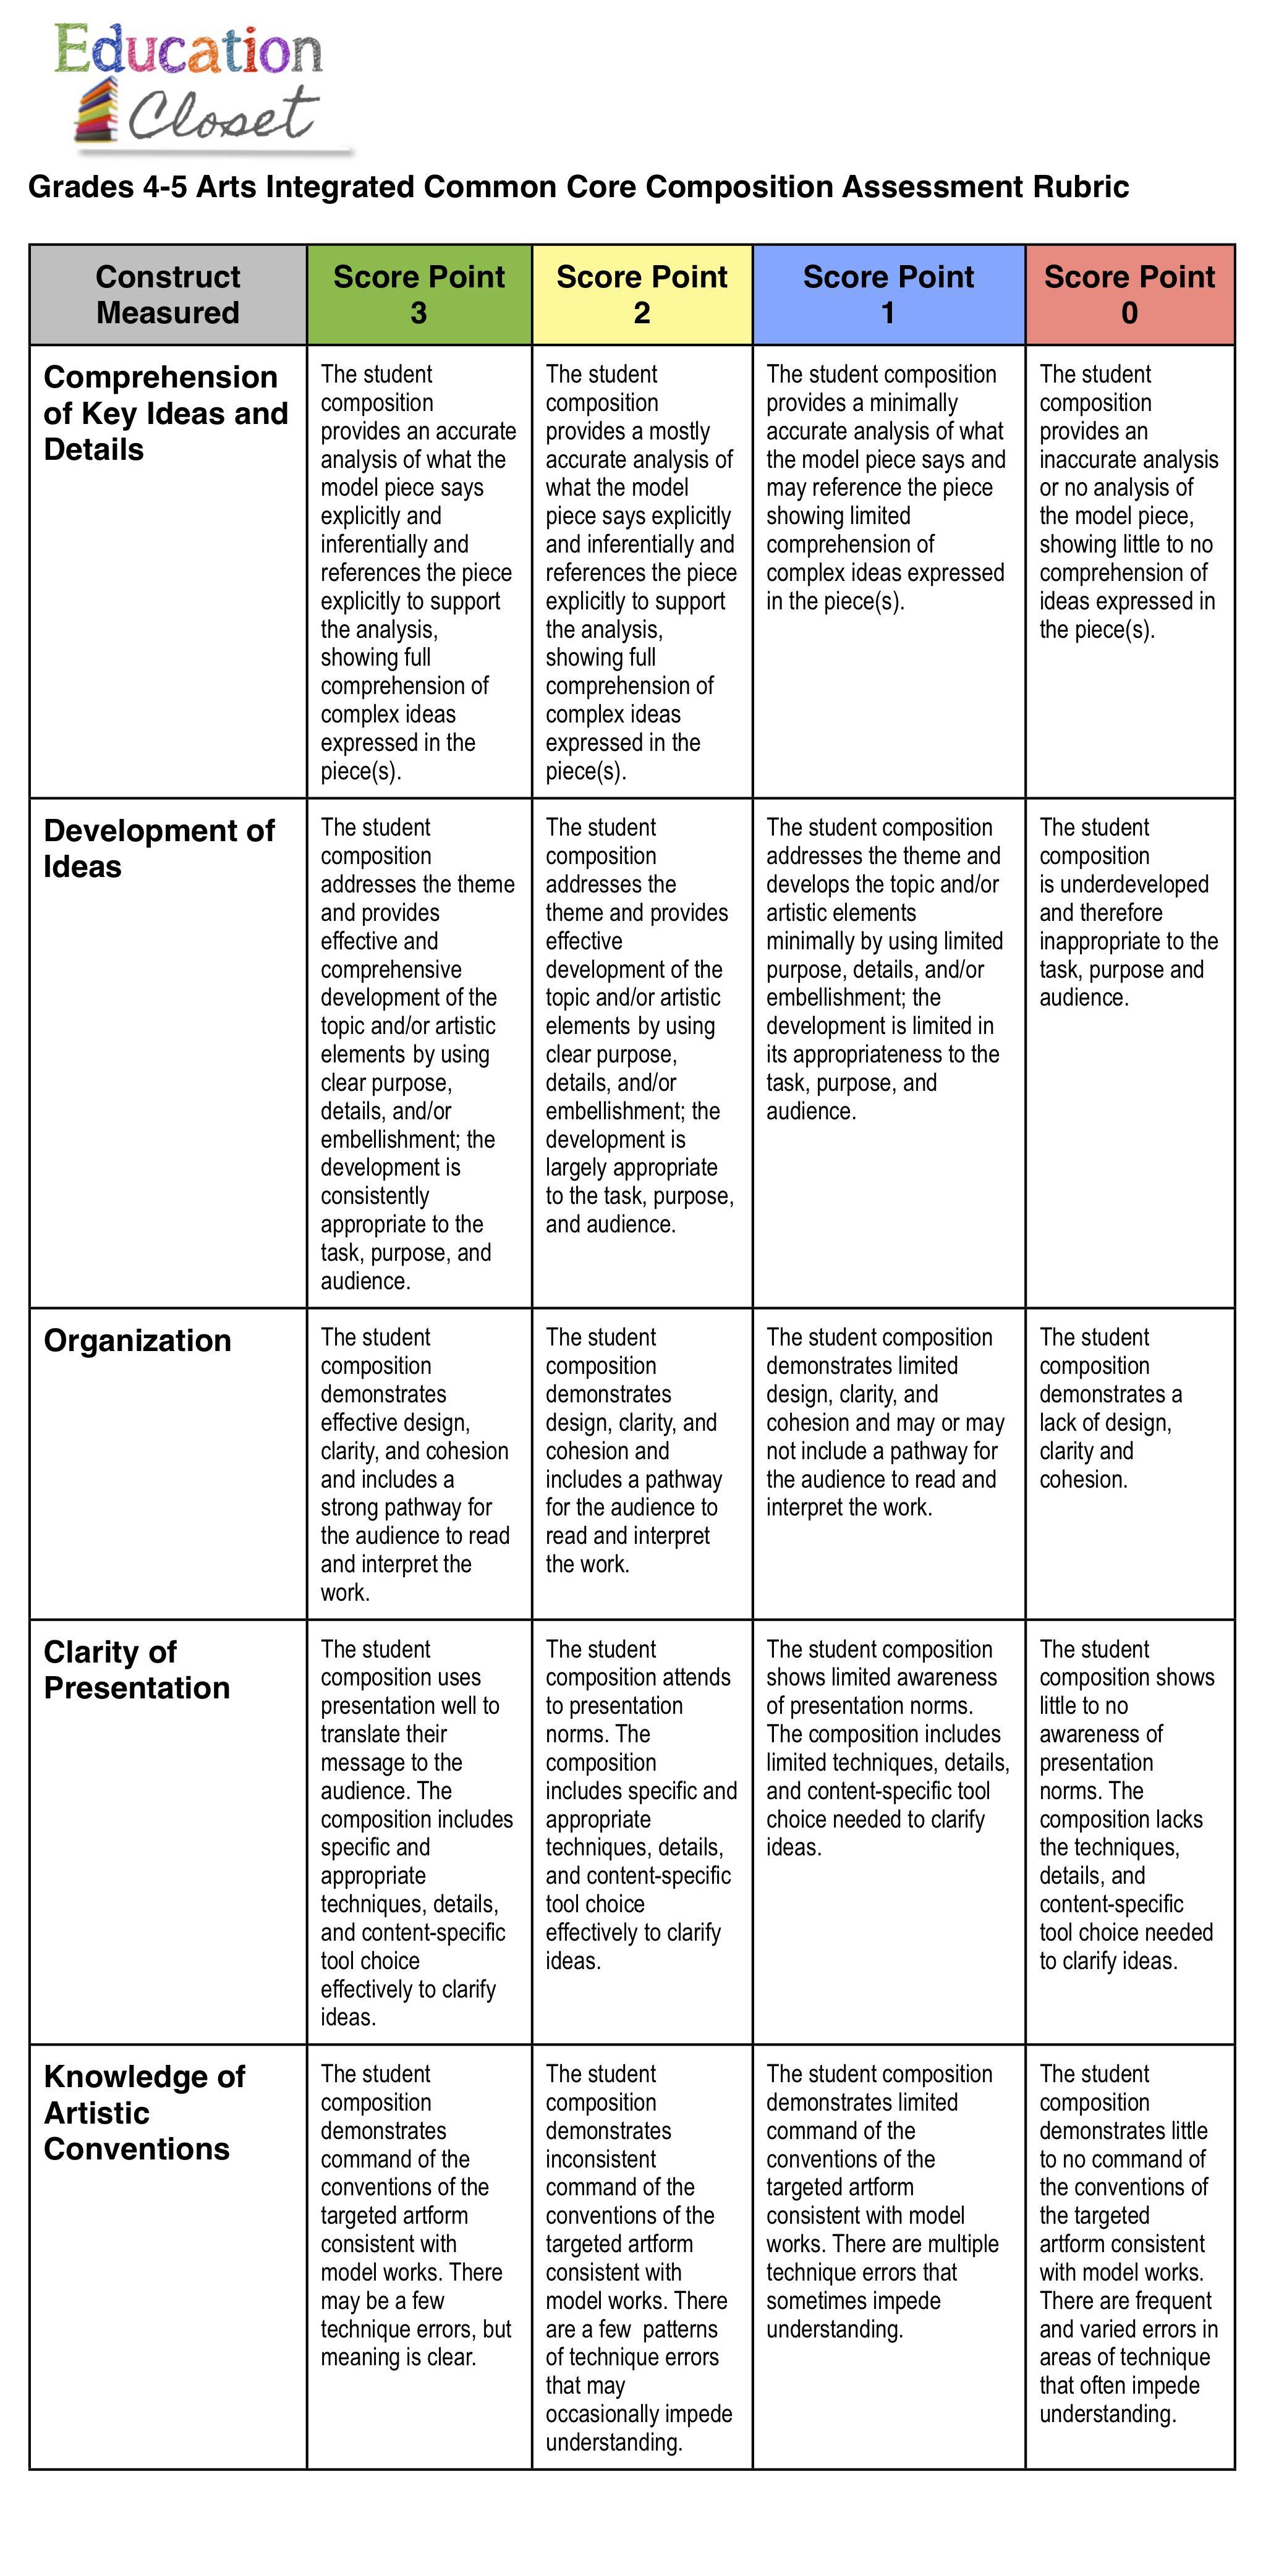 Common Core And Arts Integration Assessment Rubric Education Closet Assessment Rubric Art Rubric Rubrics